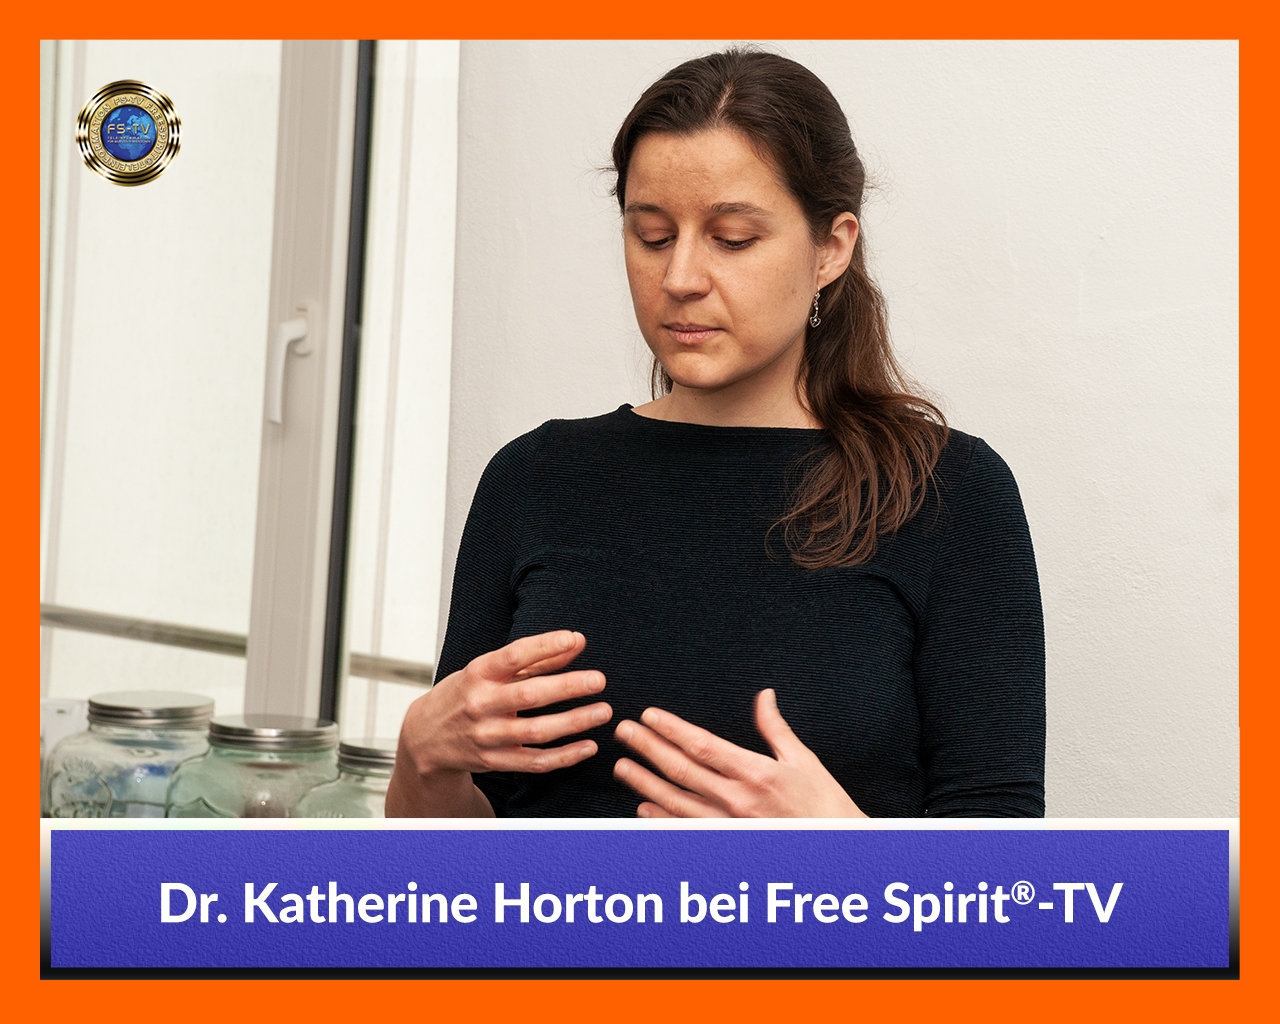 Galleriebild-Dr.Katherine-Horton-1